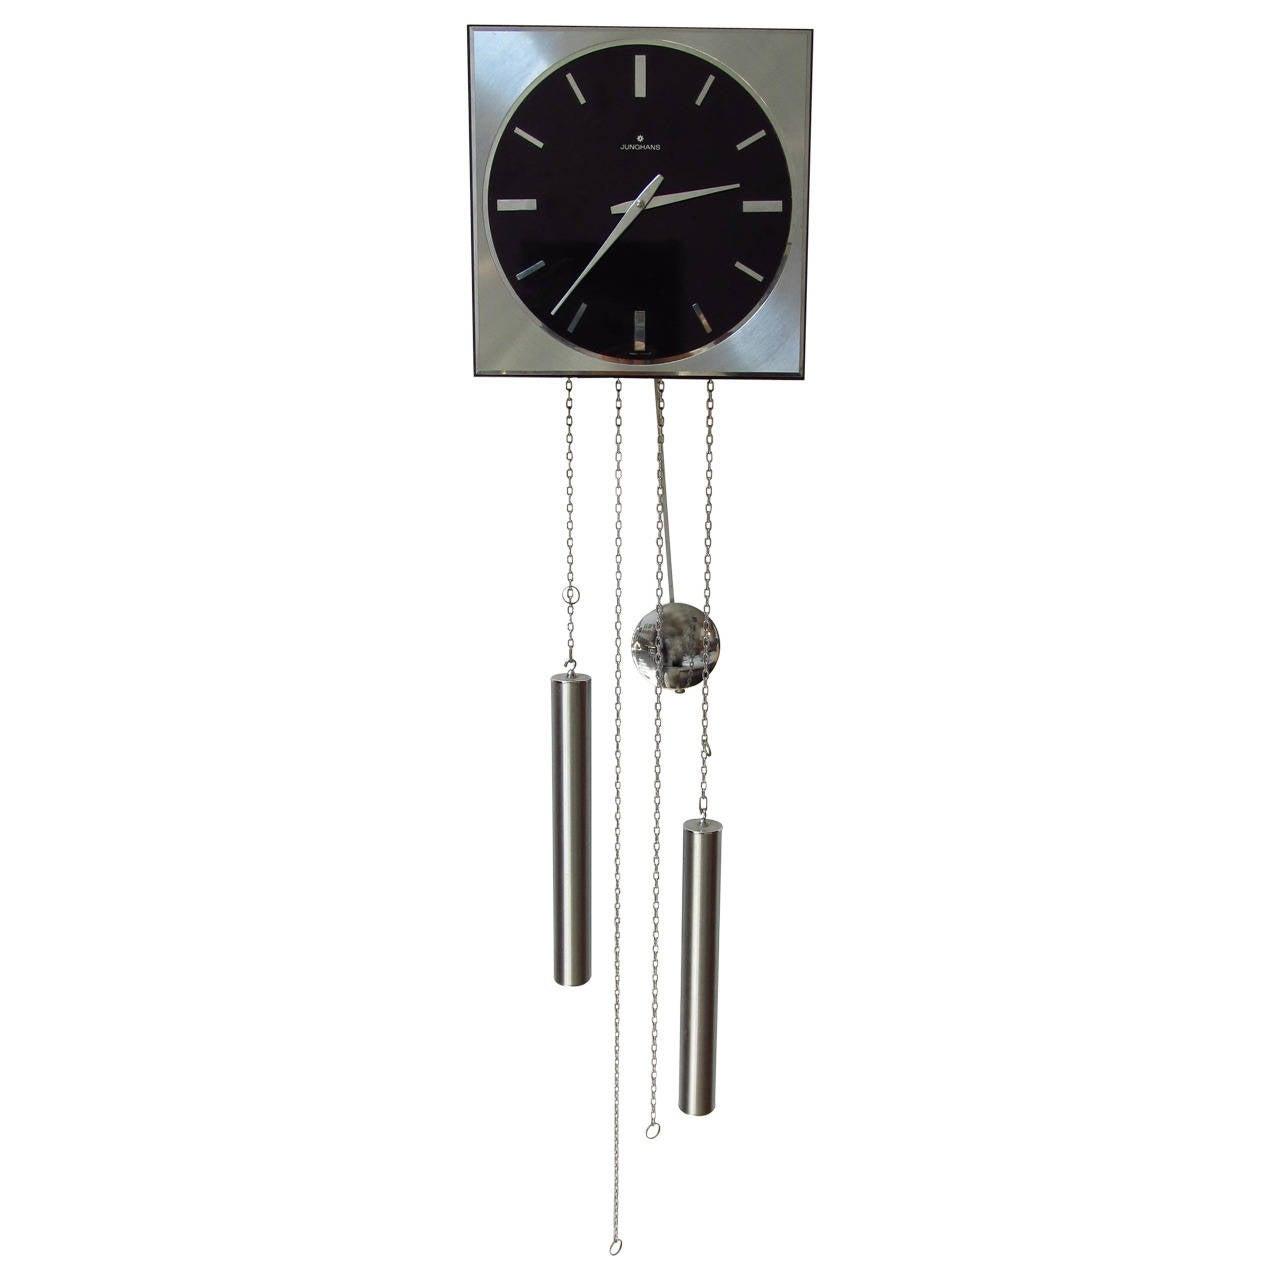 Junghans german made mid century modern pendulum clock at 1stdibs - Contemporary pendulum wall clocks ...